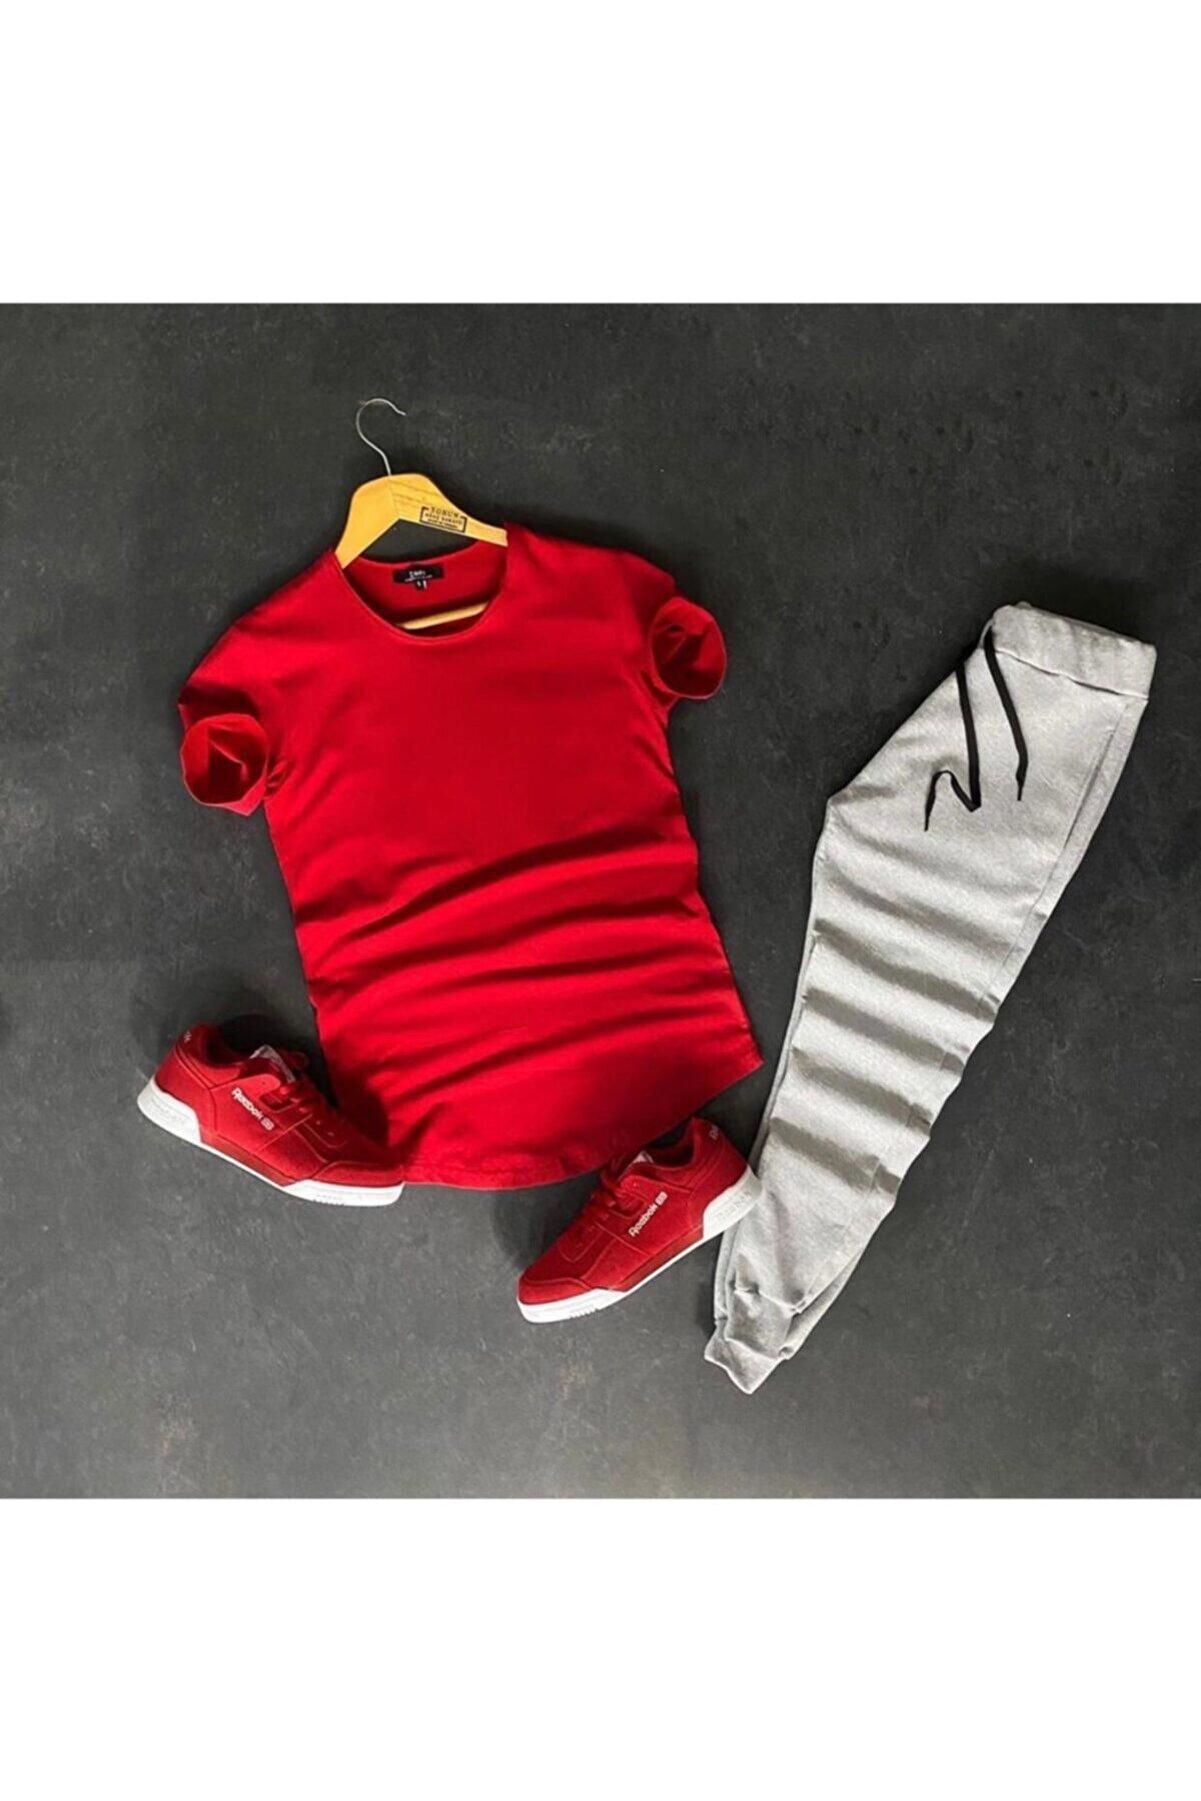 stonehill Erkek Basic Kırmızı Tshirt Eşofman İkili Takım